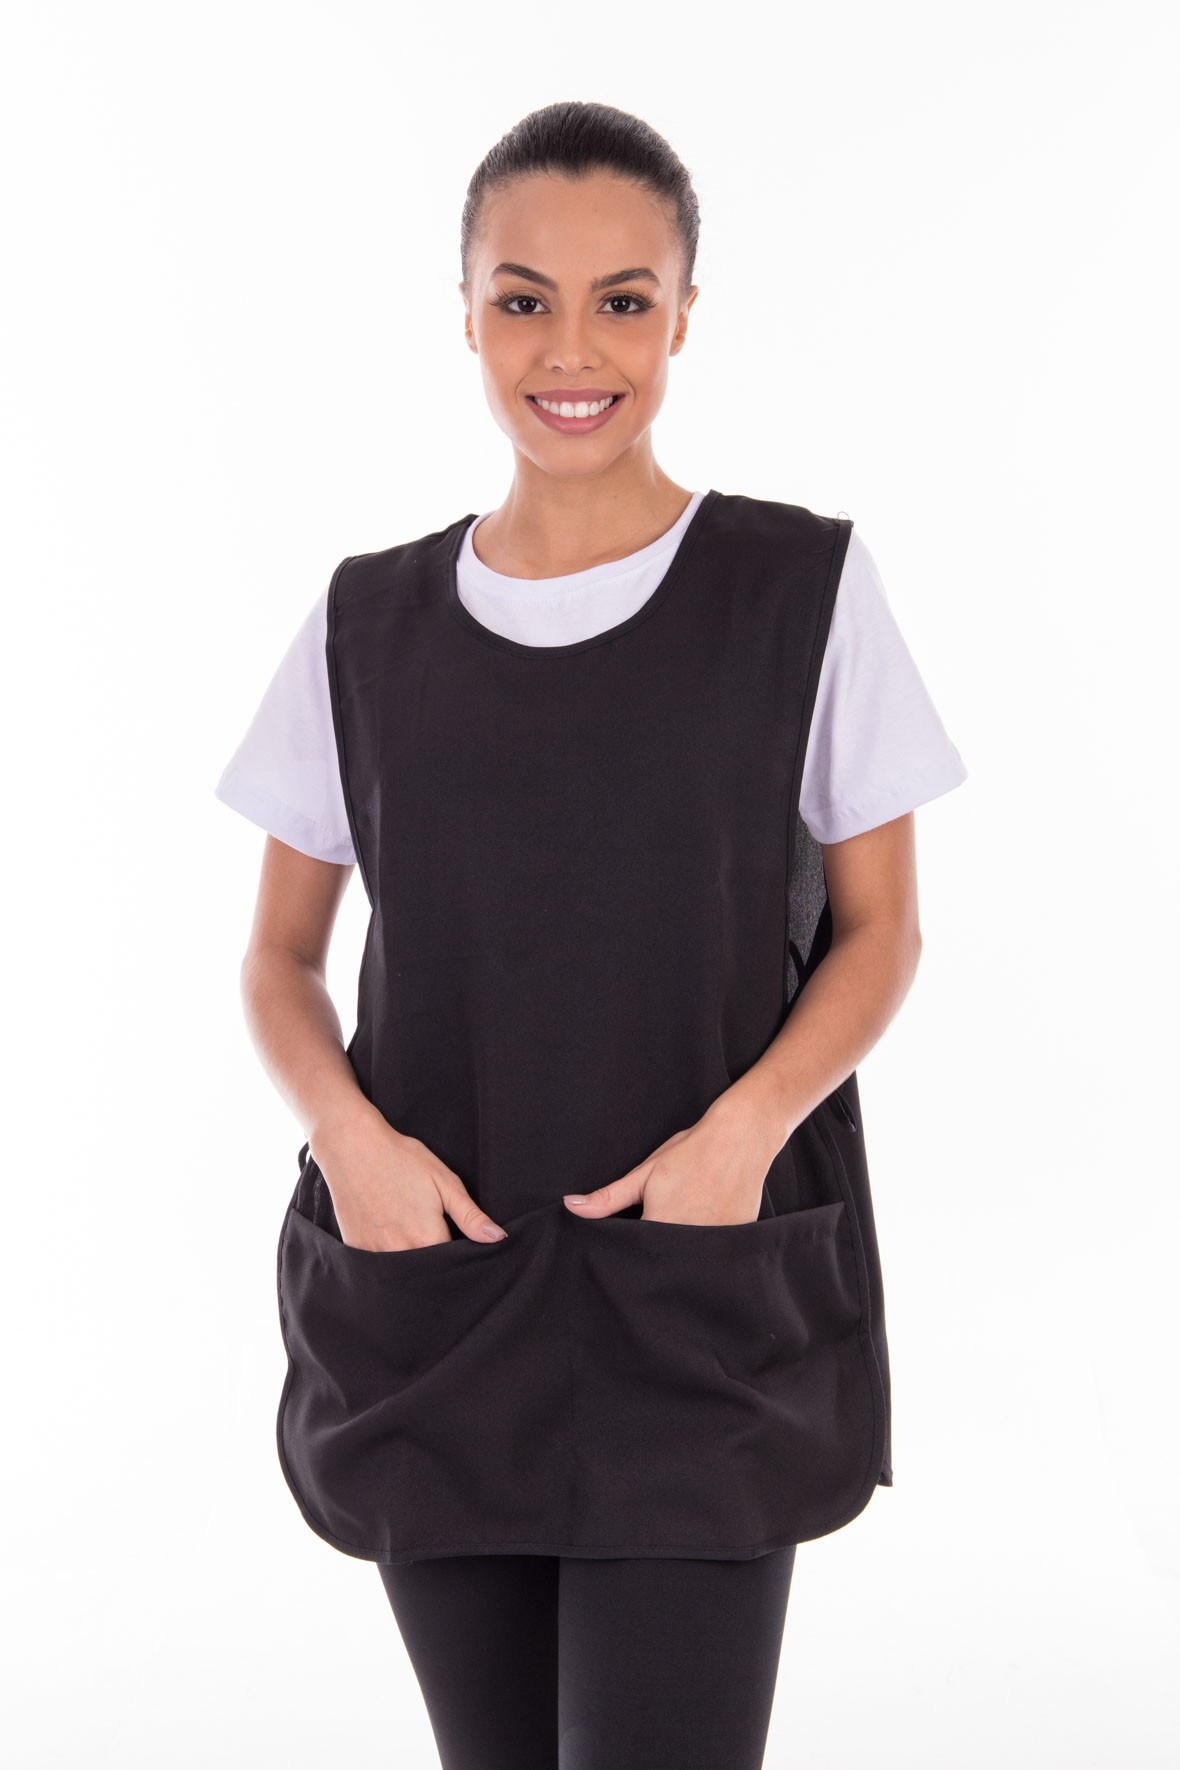 Conjunto de calça legging, camiseta e bata para copeira, arrumadeira, faxineira, babá